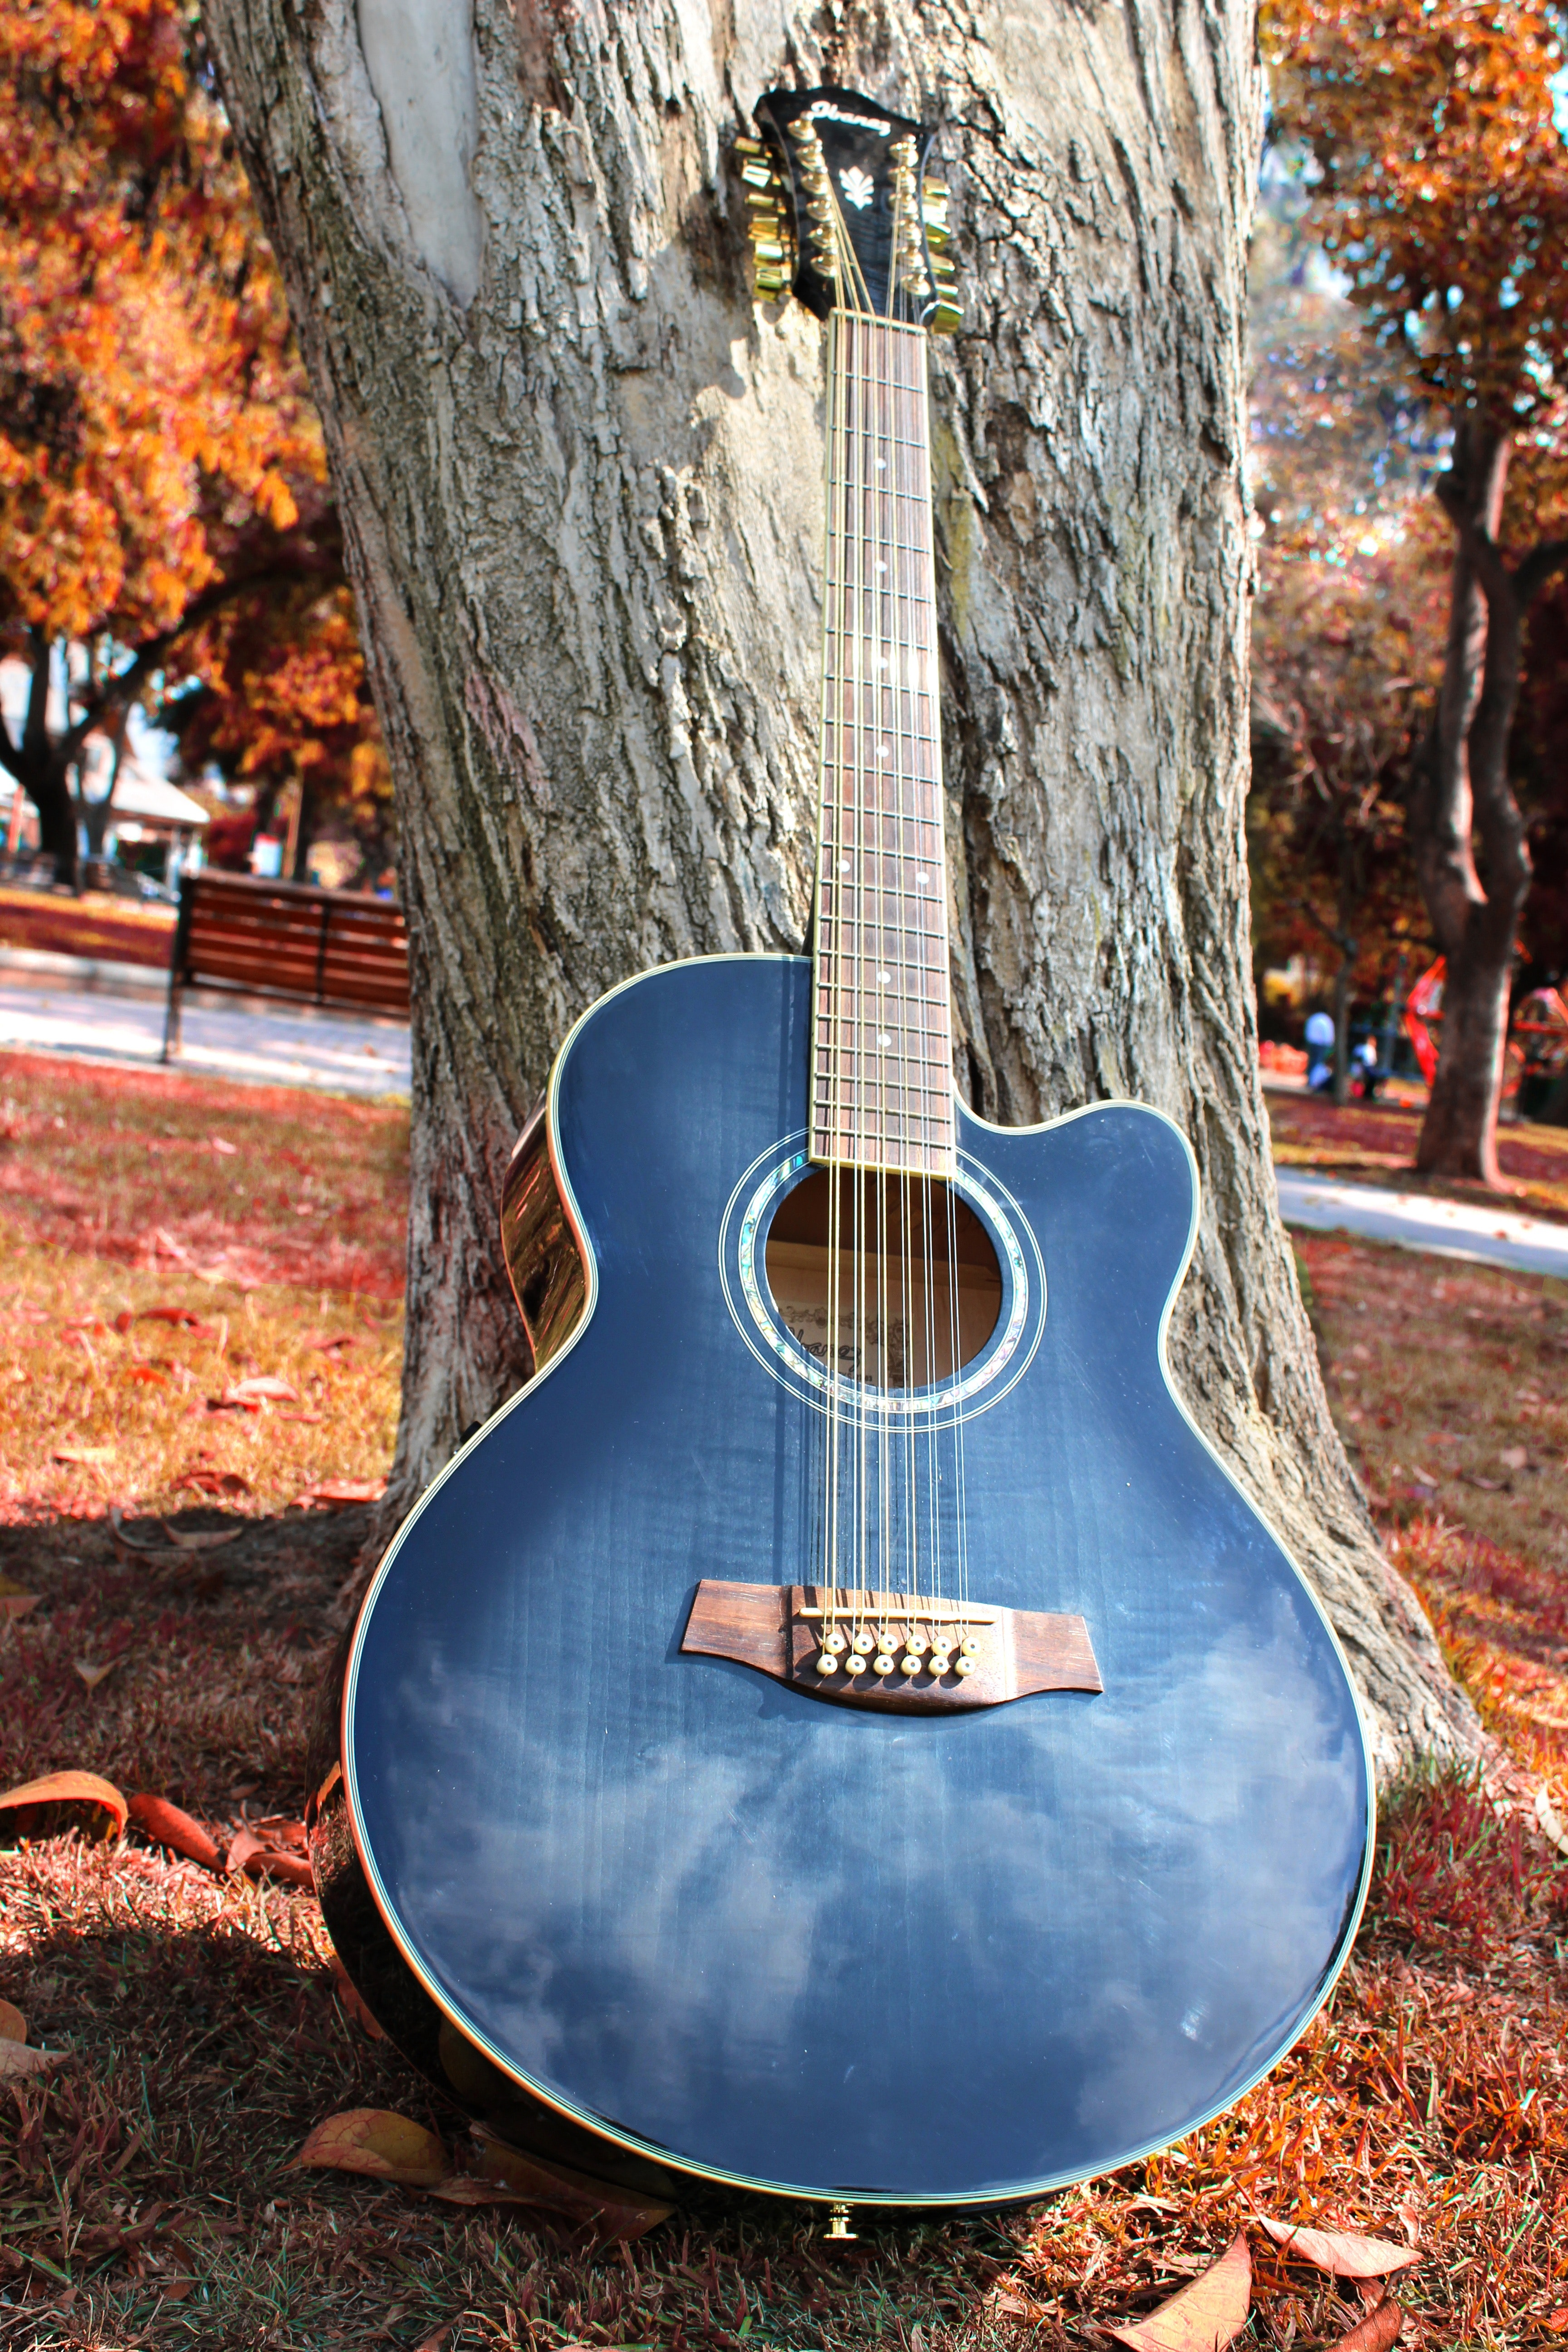 Blue cut away 12 string guitar photo